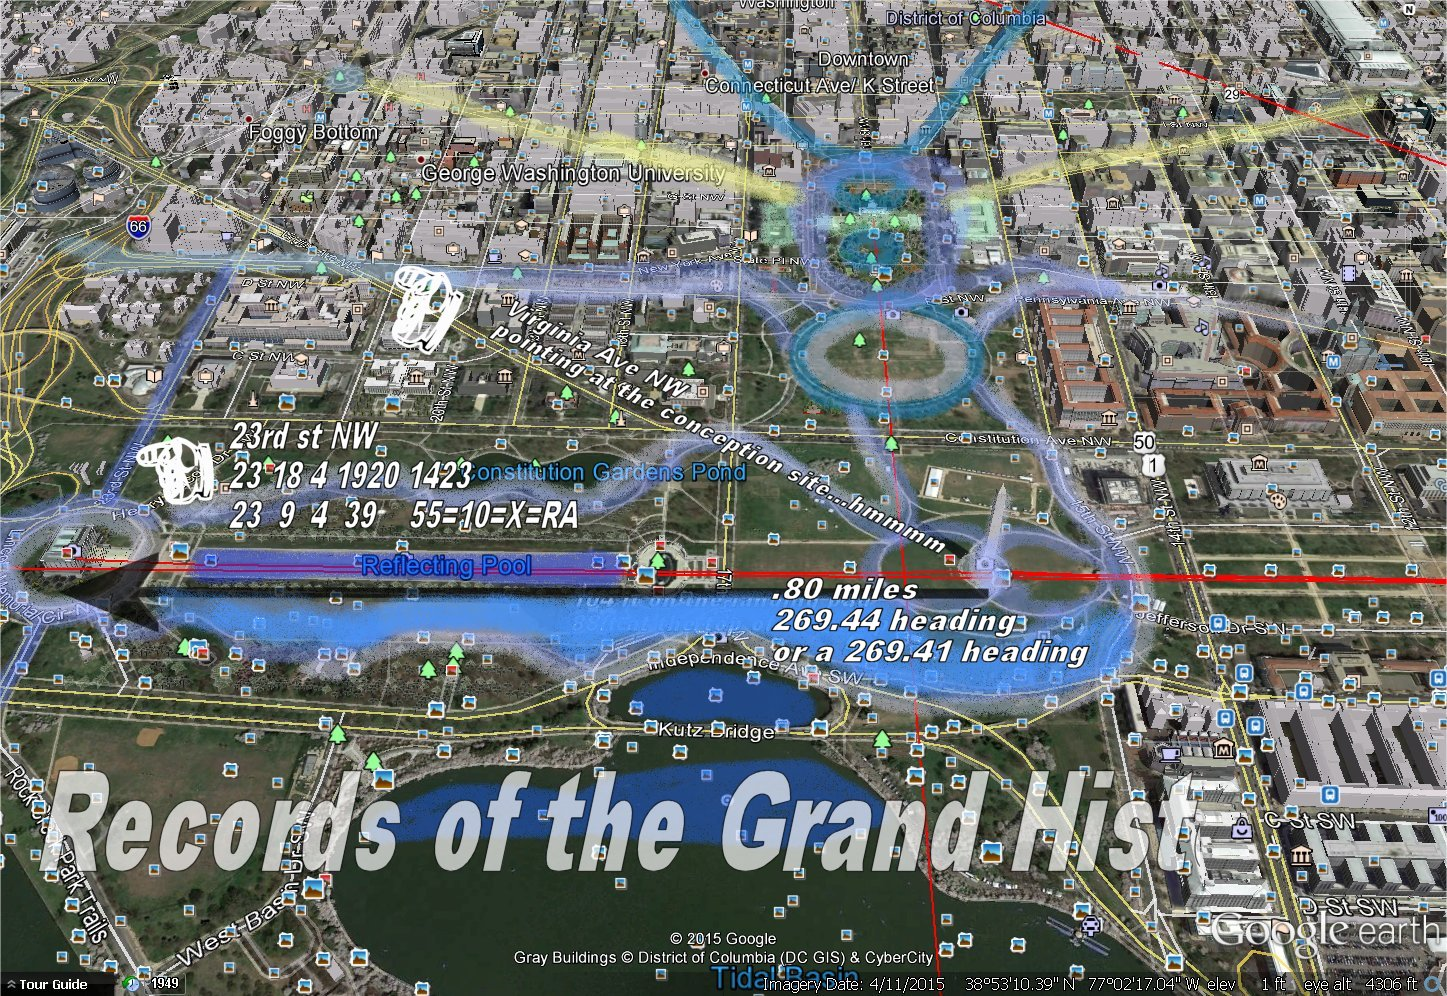 Records Of The Grand Historian ISIS In Washington DC And The Sa - Washington dc map conspiracy